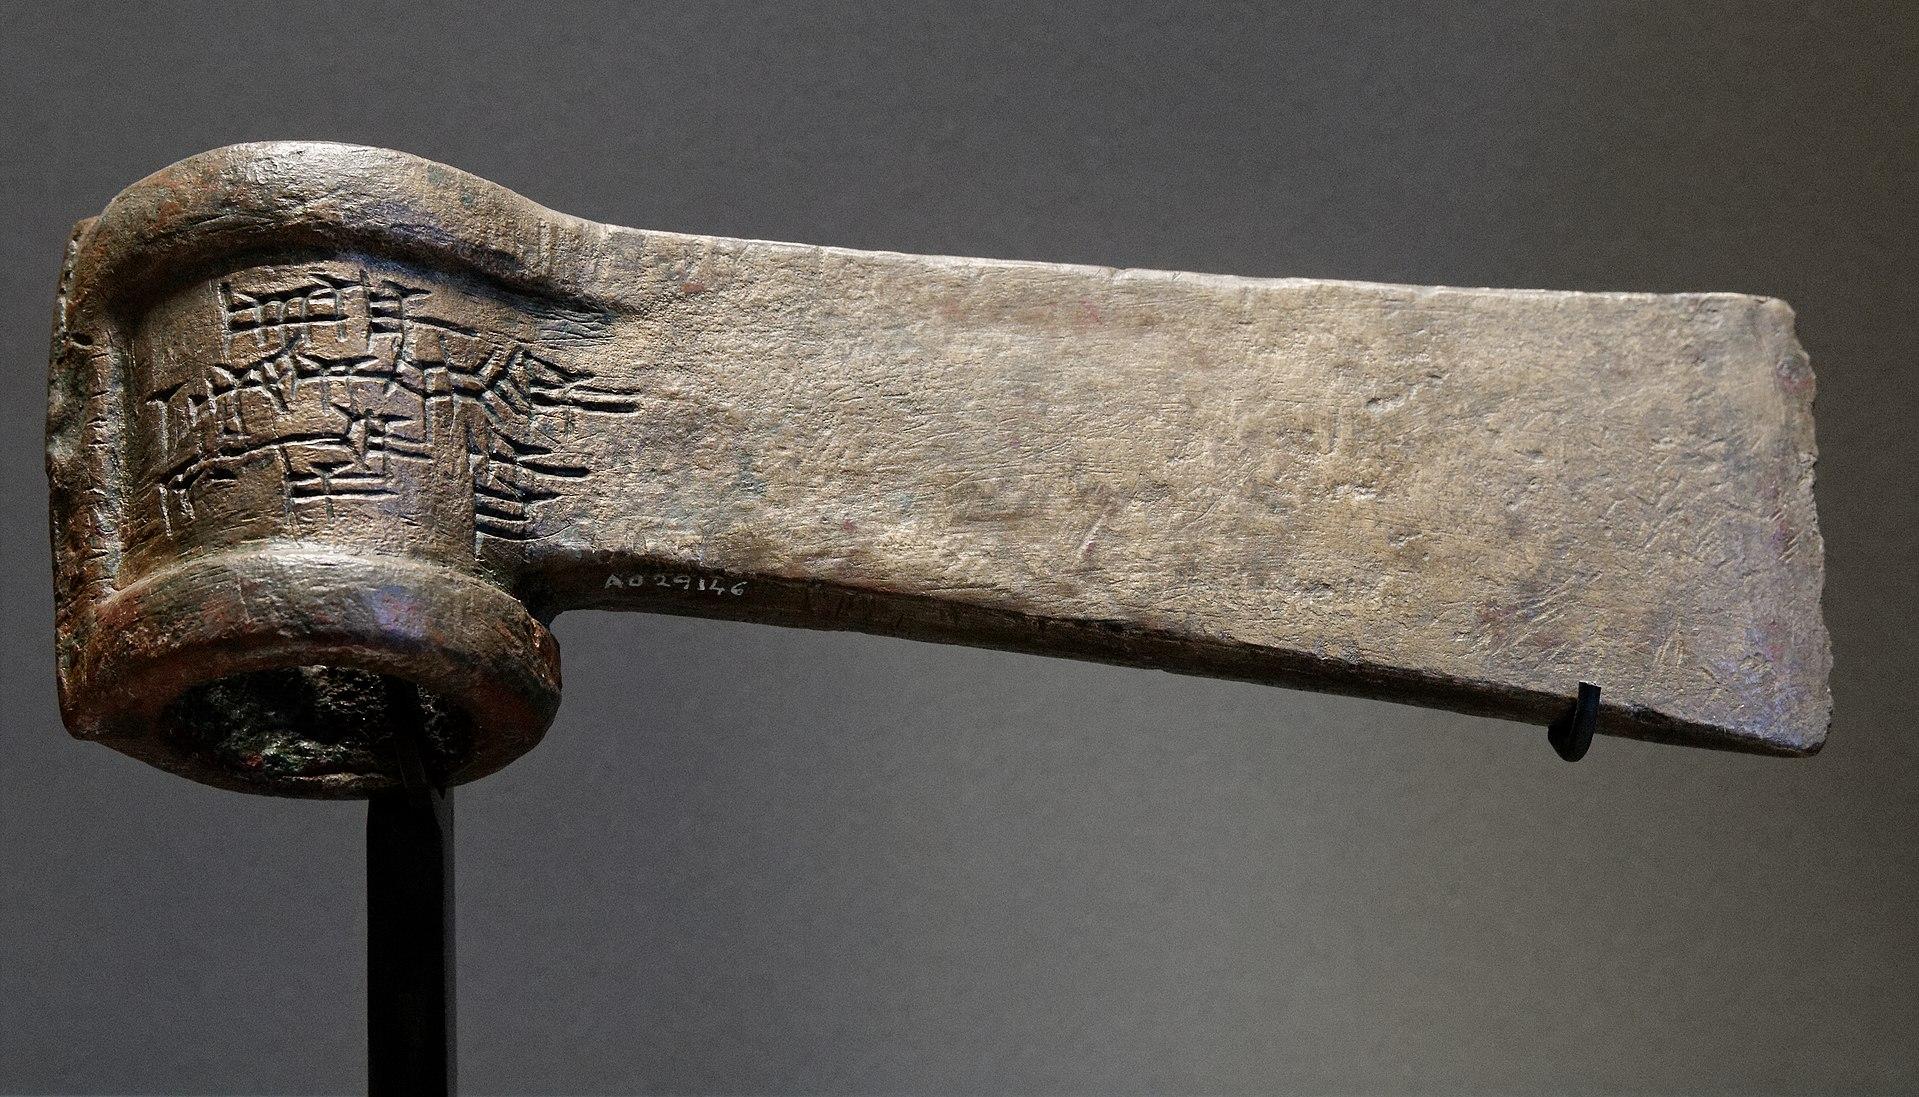 Adad-nirari I's Axe Blade